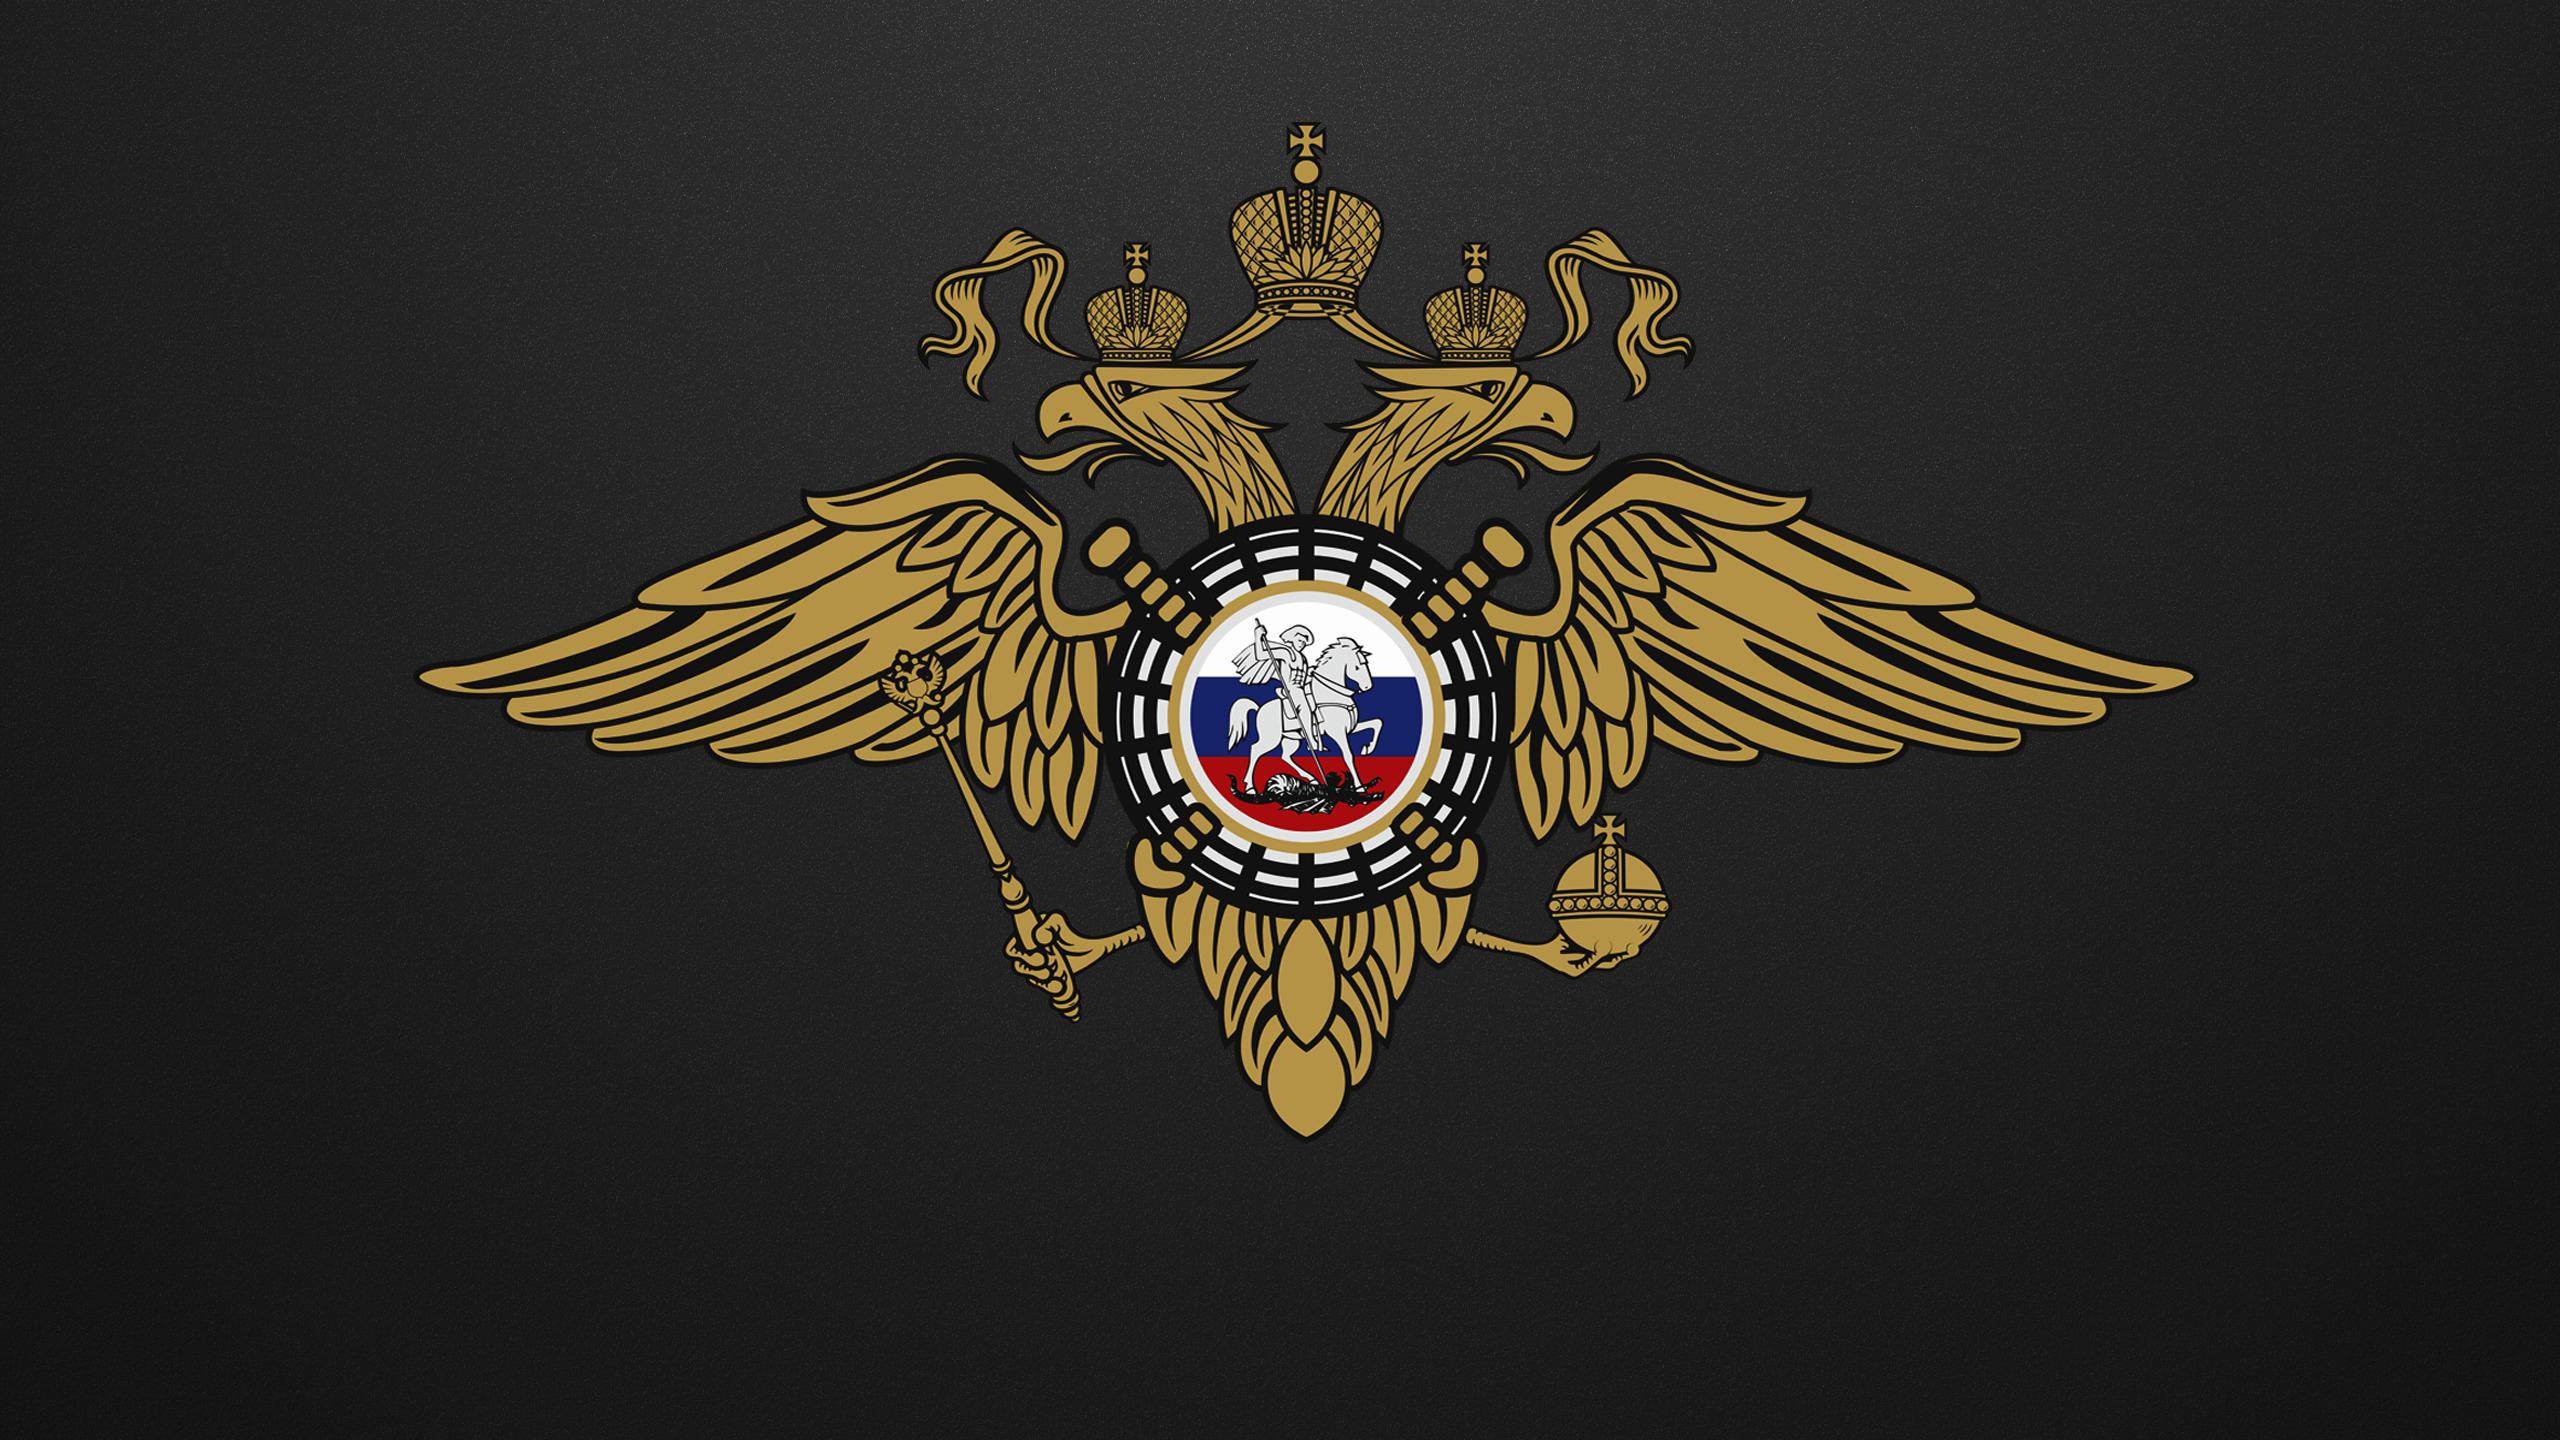 Russian Army Wallpaper Hd: Russian Wallpapers For Desktop